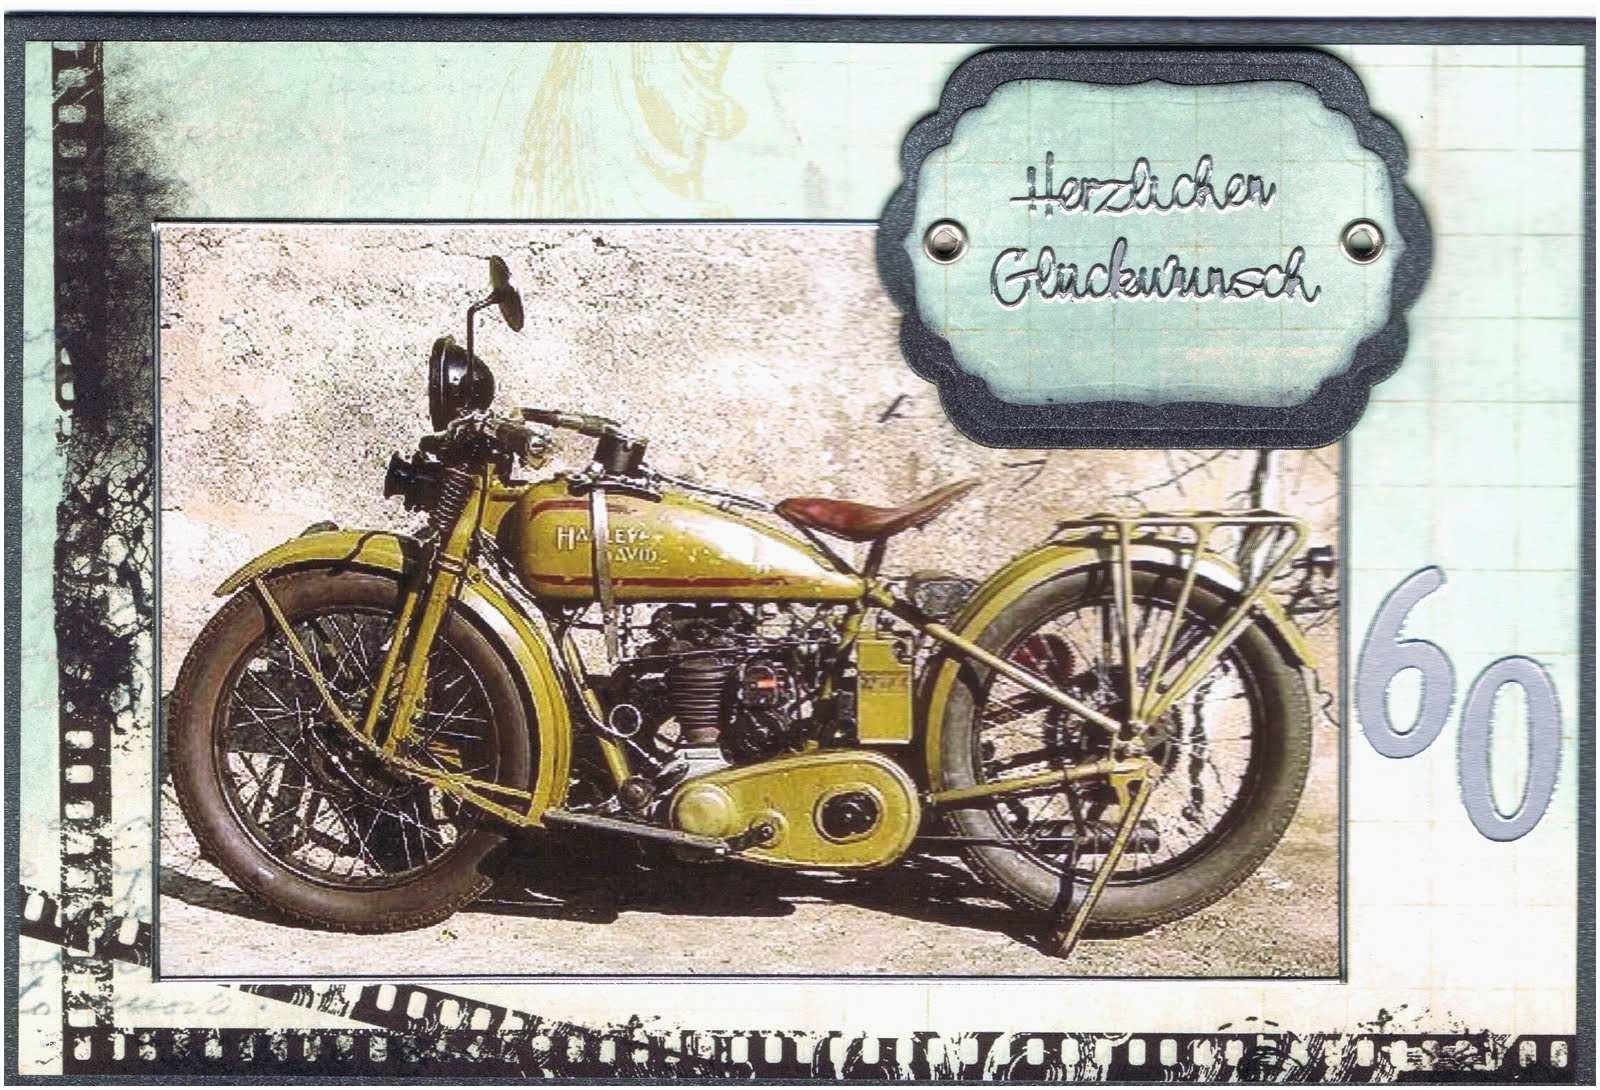 Geburtstagsbilder Motorrad  Geburtstag Motorrad Neu Ledrojaner Hat Heute Geburtstag